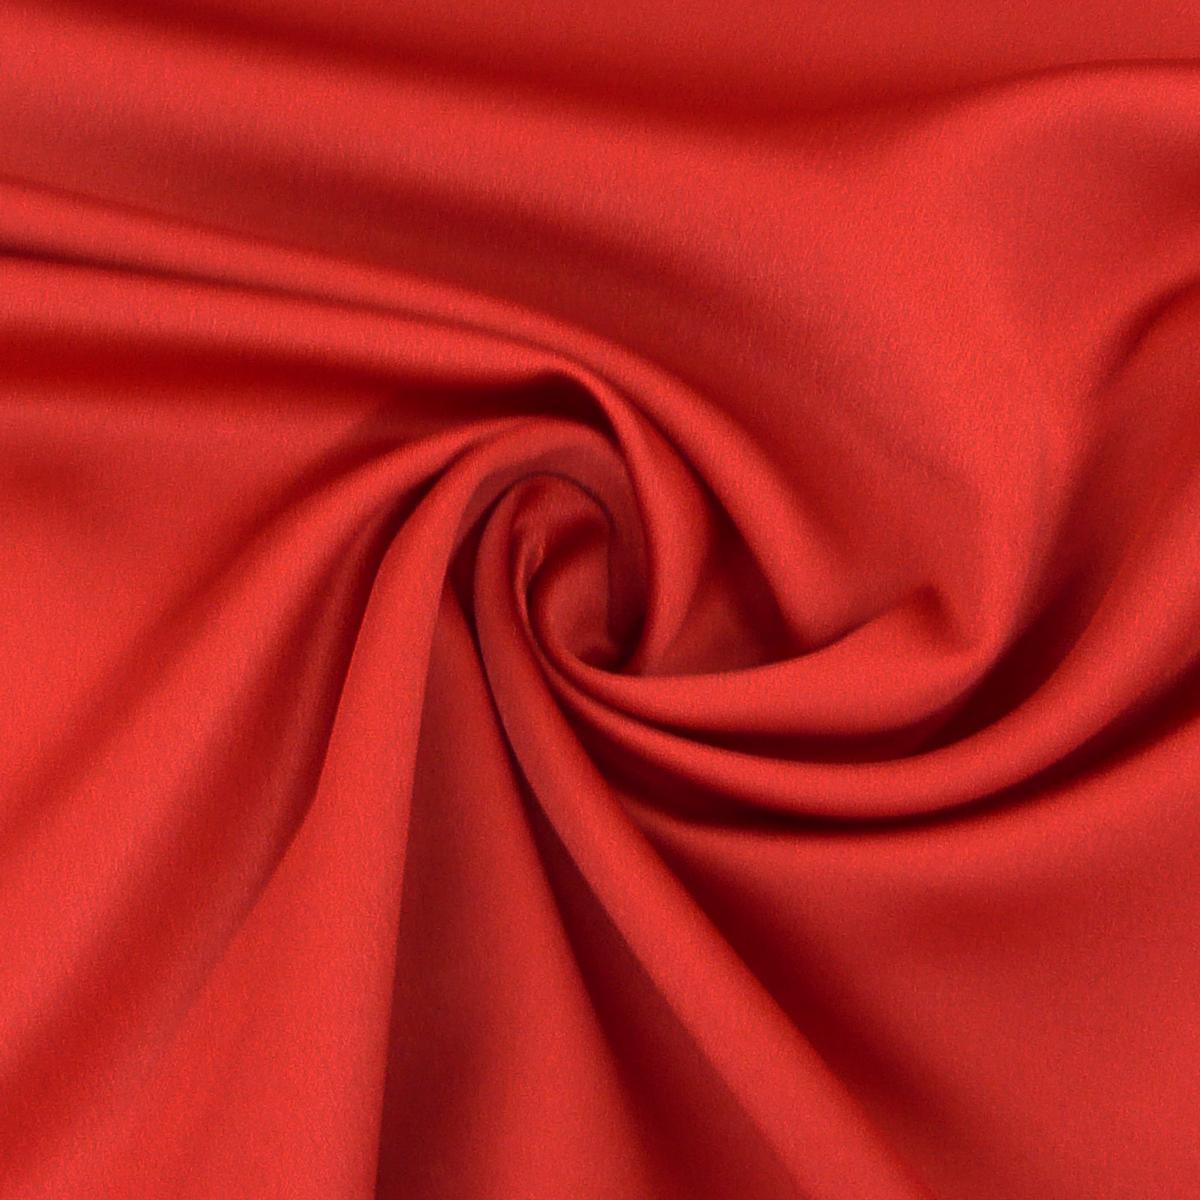 gardinenstoff meterware velvet einfarbig rot 1 48m breite stoffe stoffe uni polyester. Black Bedroom Furniture Sets. Home Design Ideas